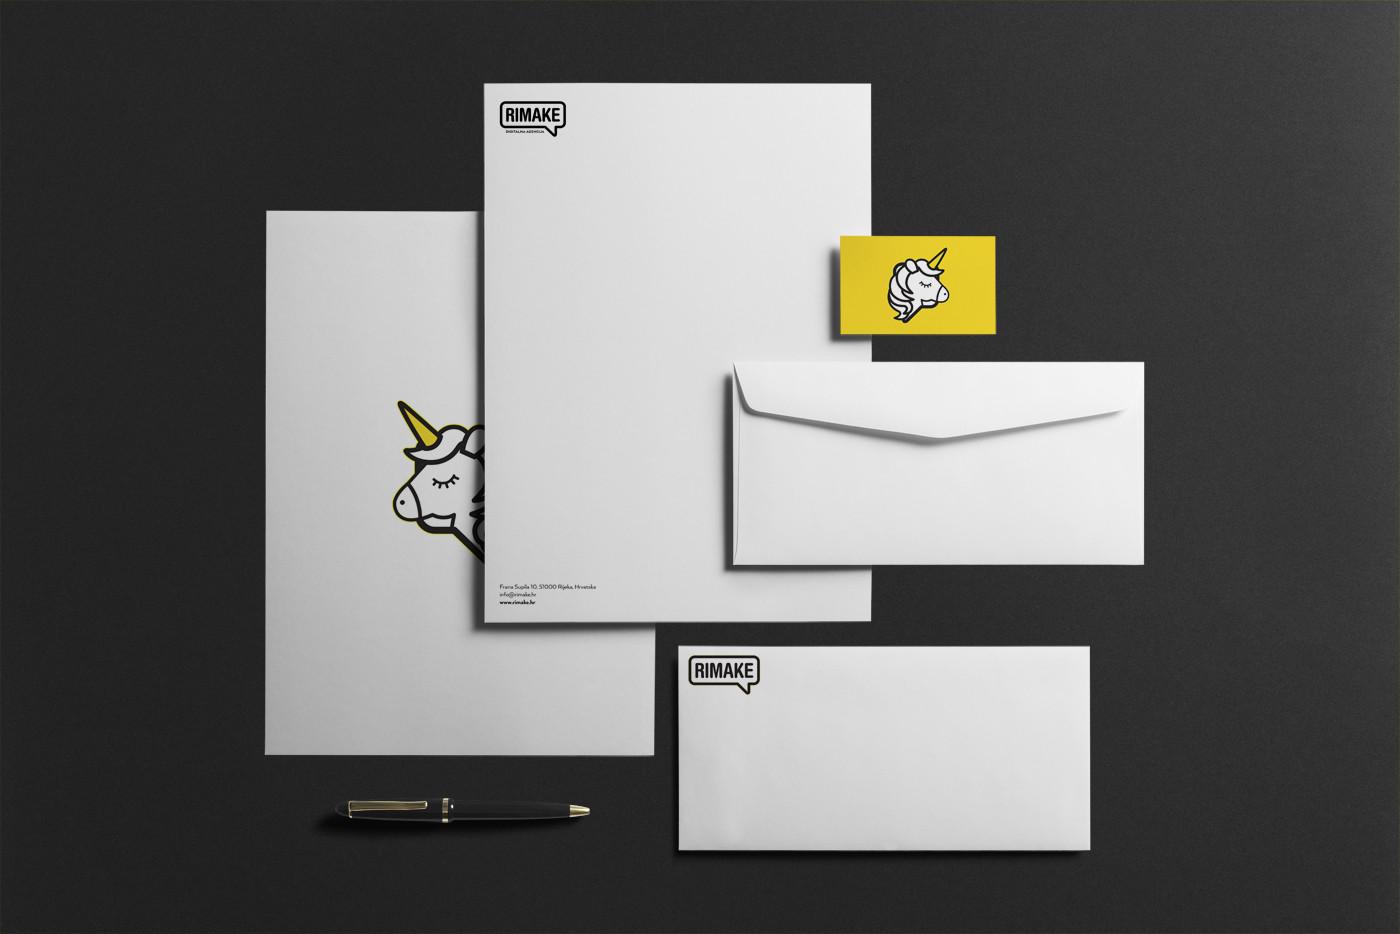 zambelli_brand_design-rimake